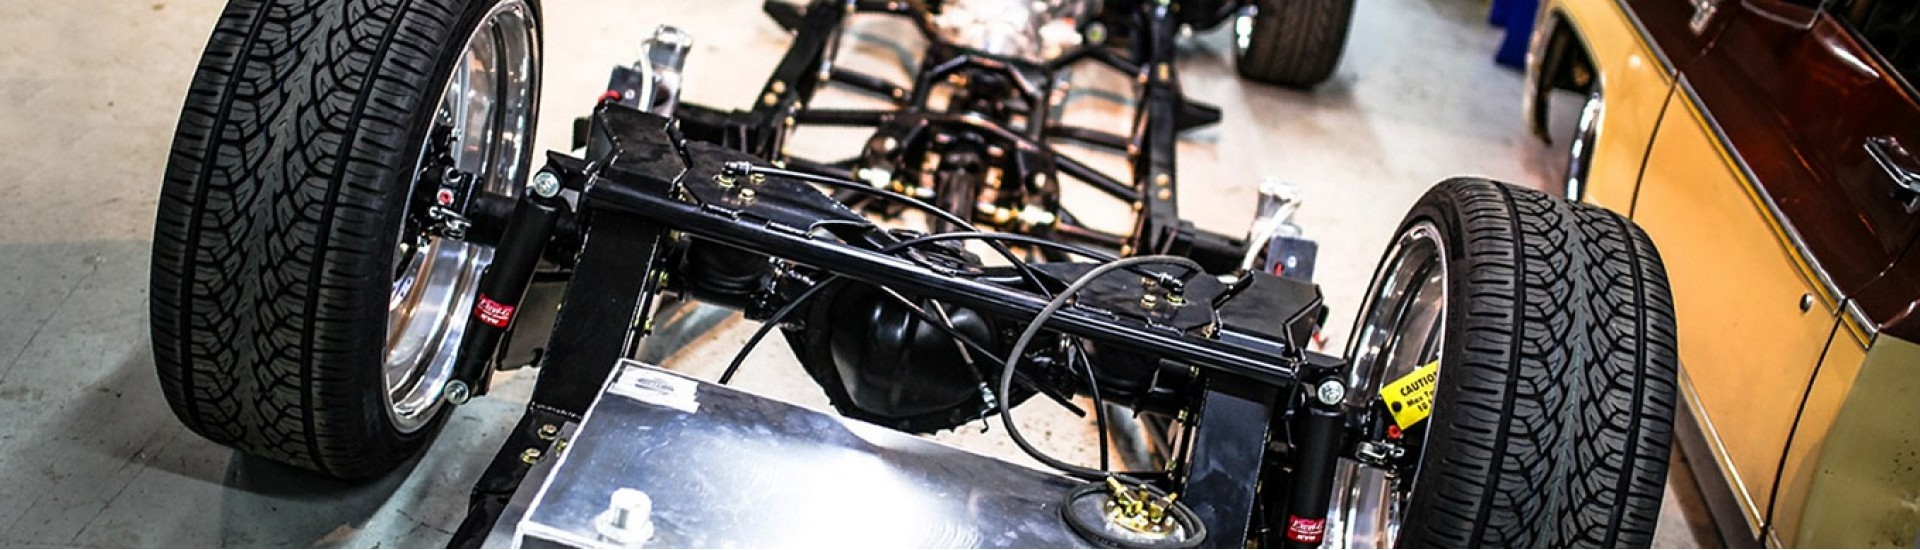 شاسی ، قیمت شاسی ، شاسی فابریک ، chassis frames & body